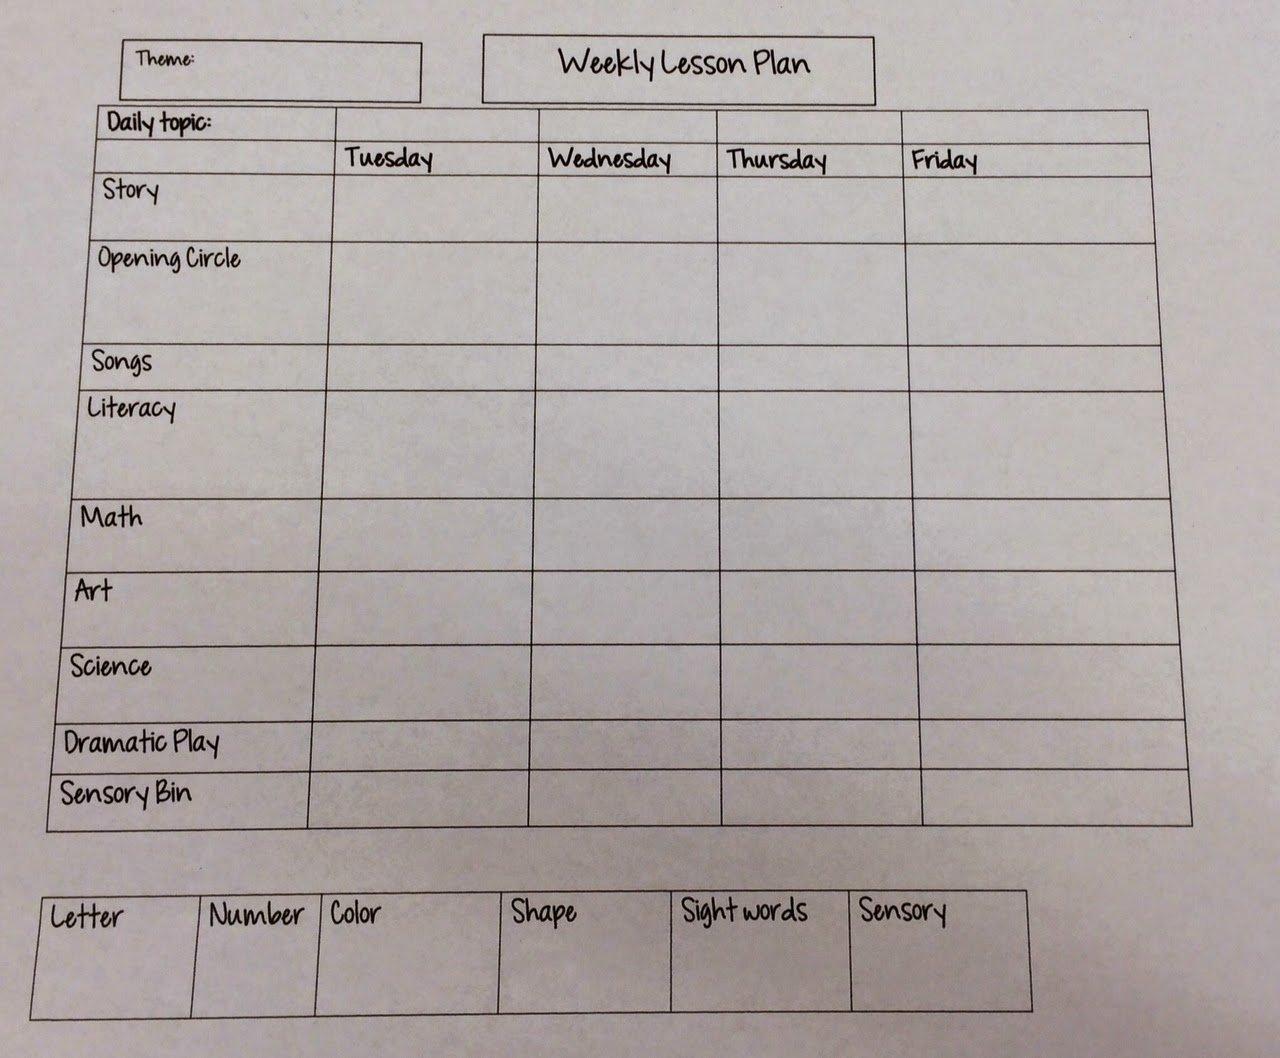 Miss Nicole S Preschool Weekly Lesson Plan Template